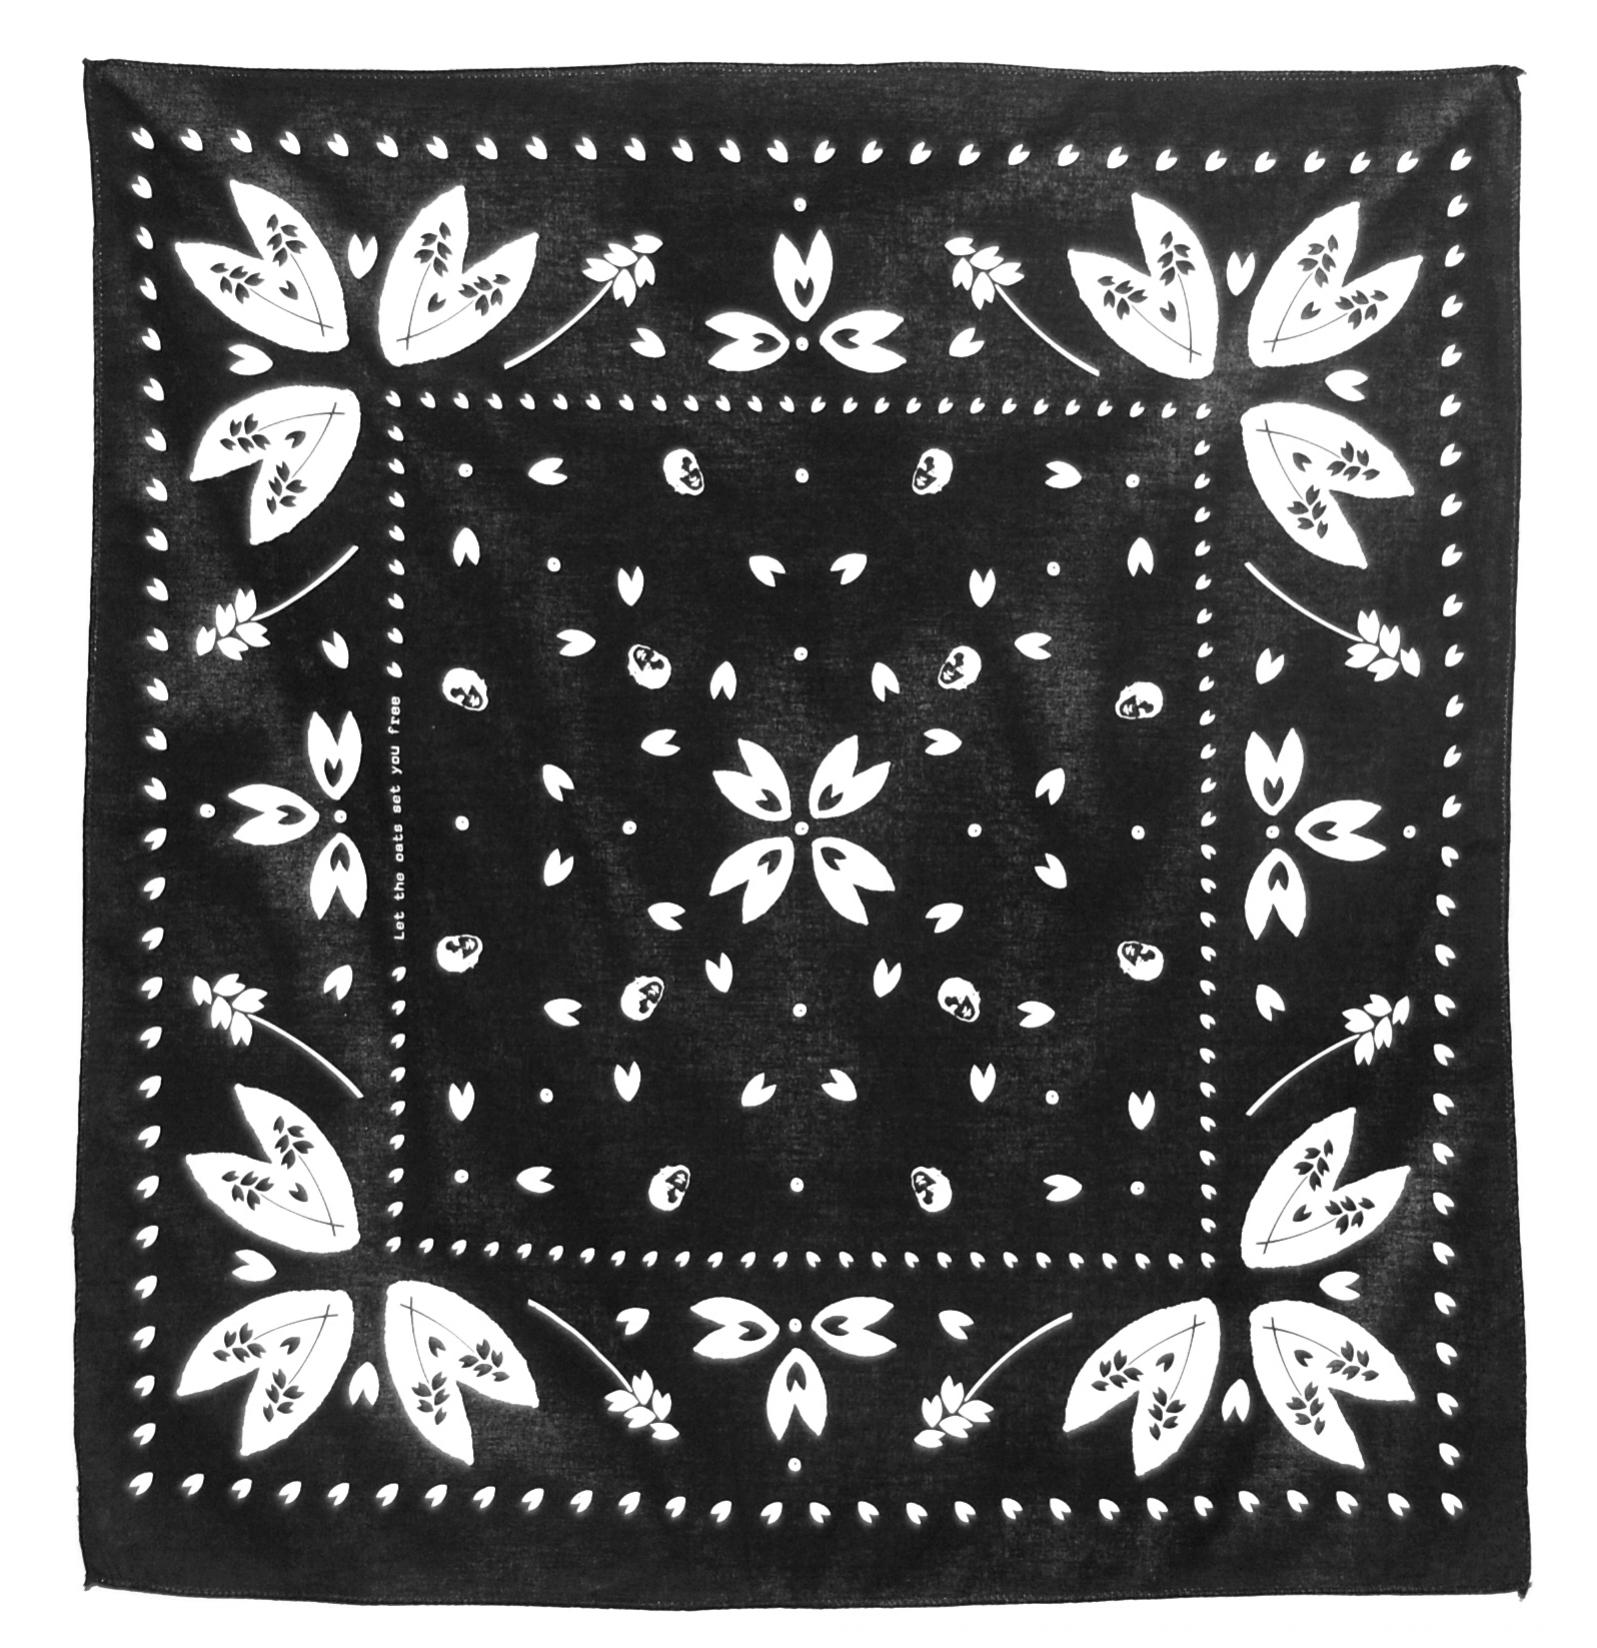 bandana-wall-crop.jpg